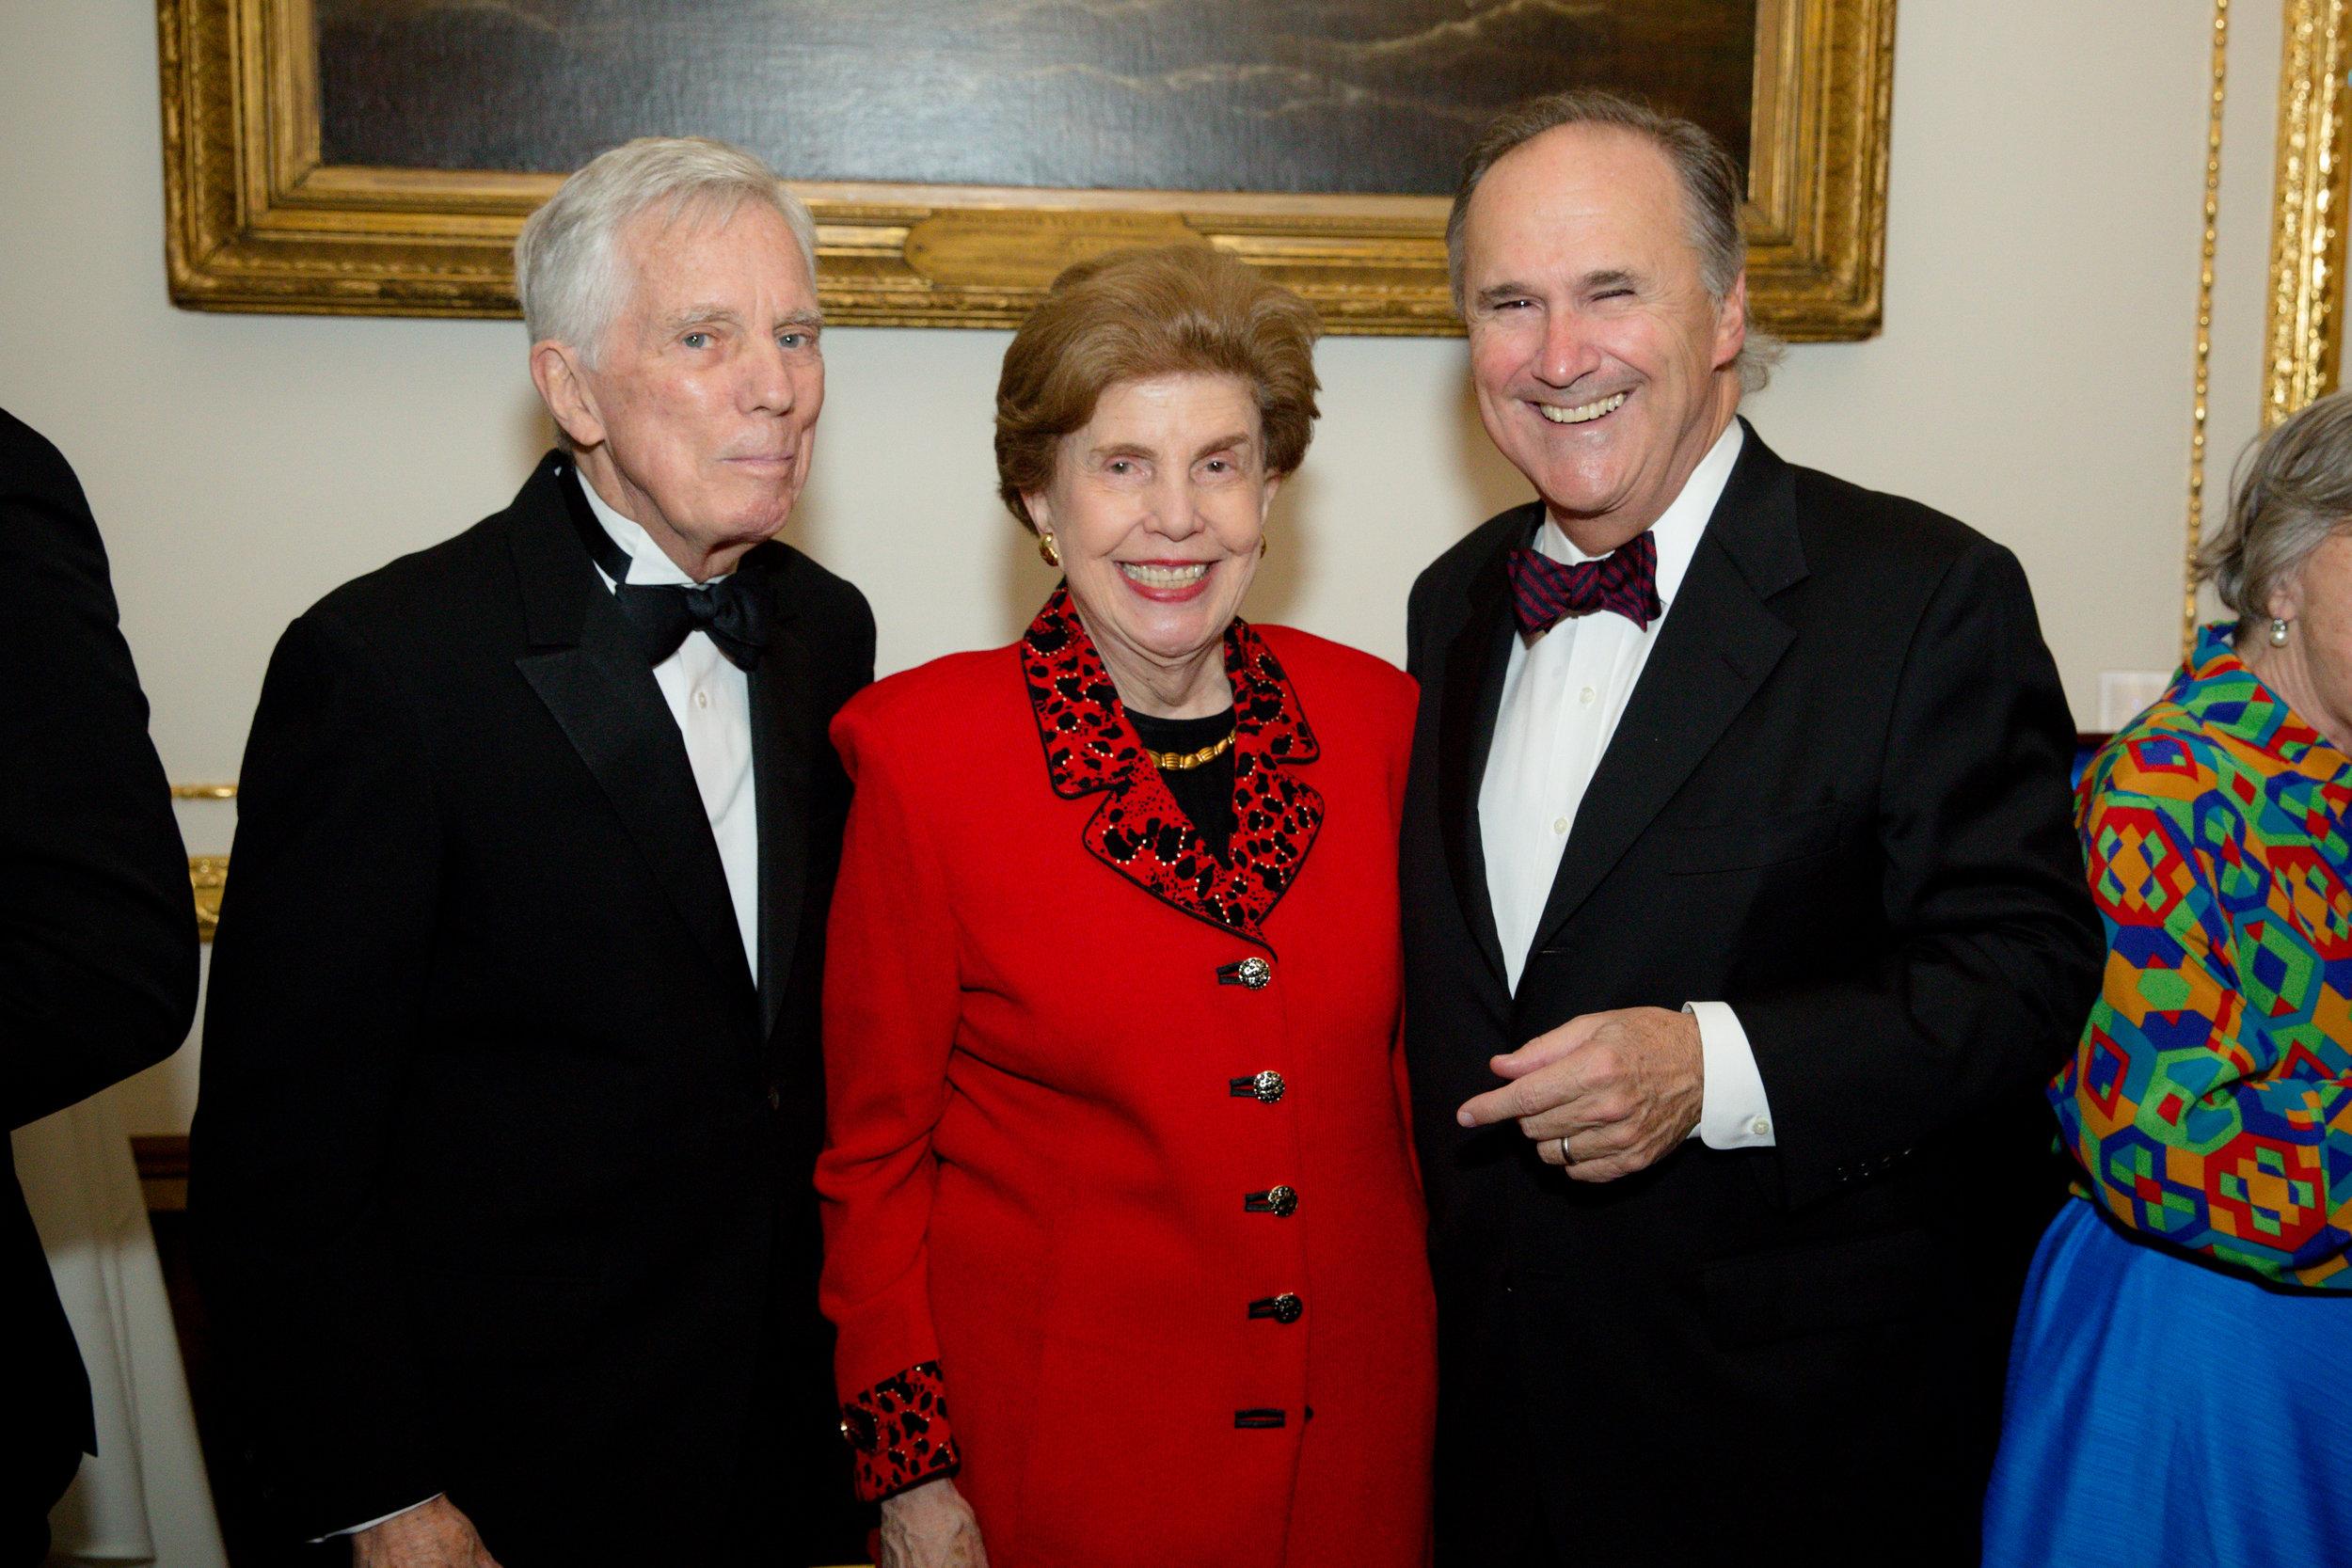 James Shields, Susan Gitelson, Paul Antinozzi